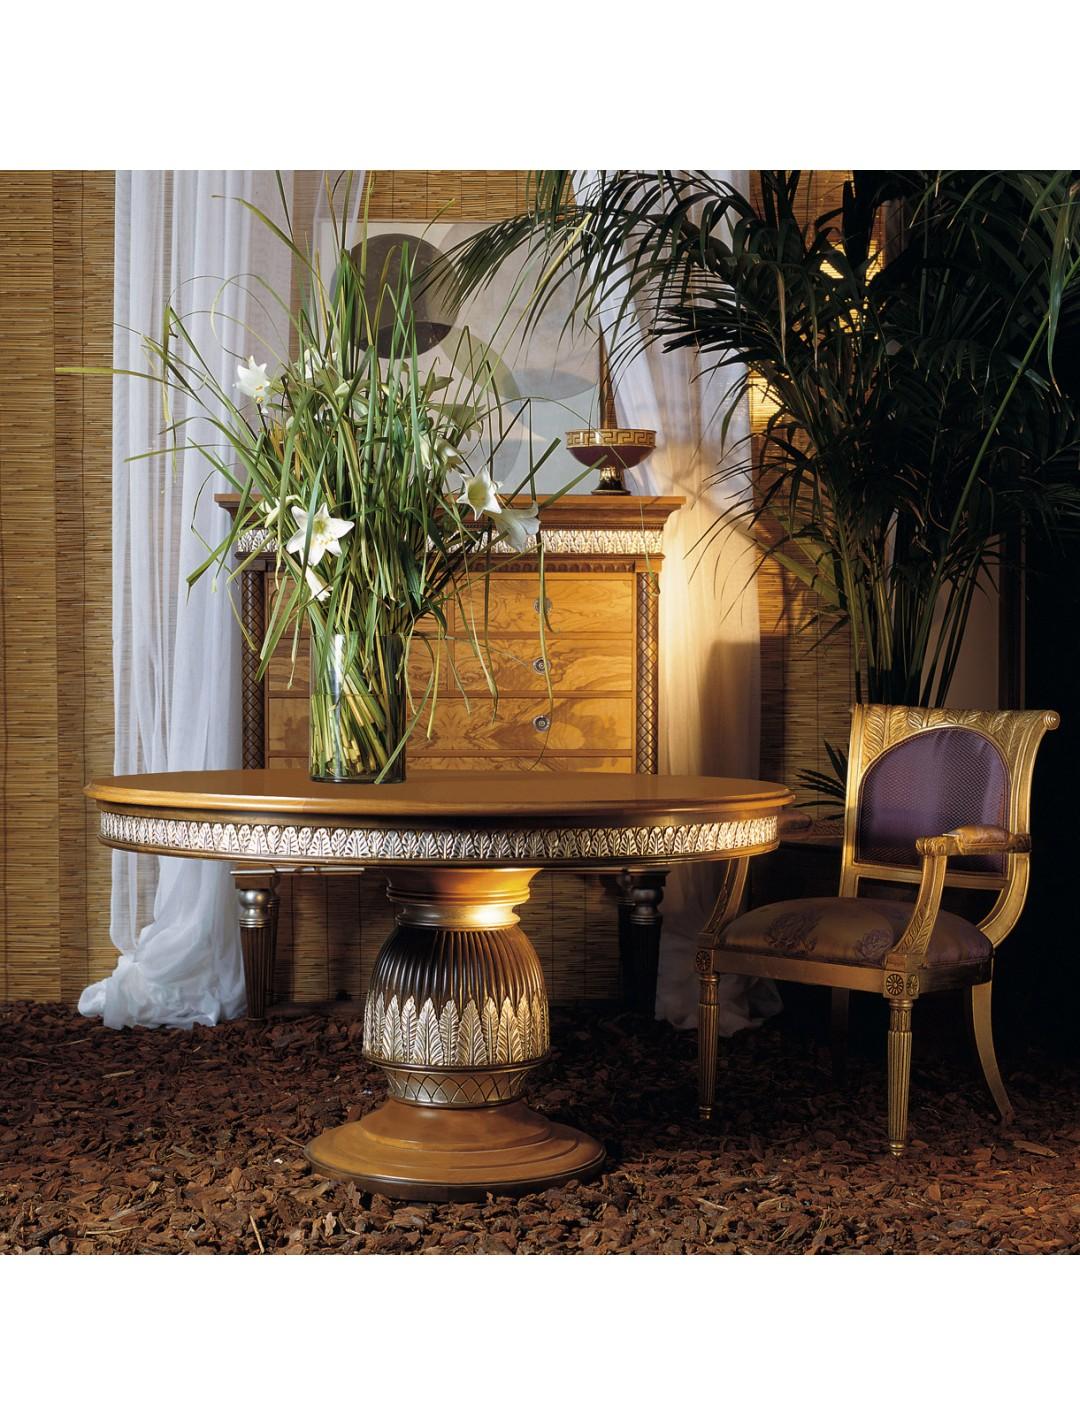 Atenea Dining Table Aged Olive Tree Root Veneer Top 170 Cm D